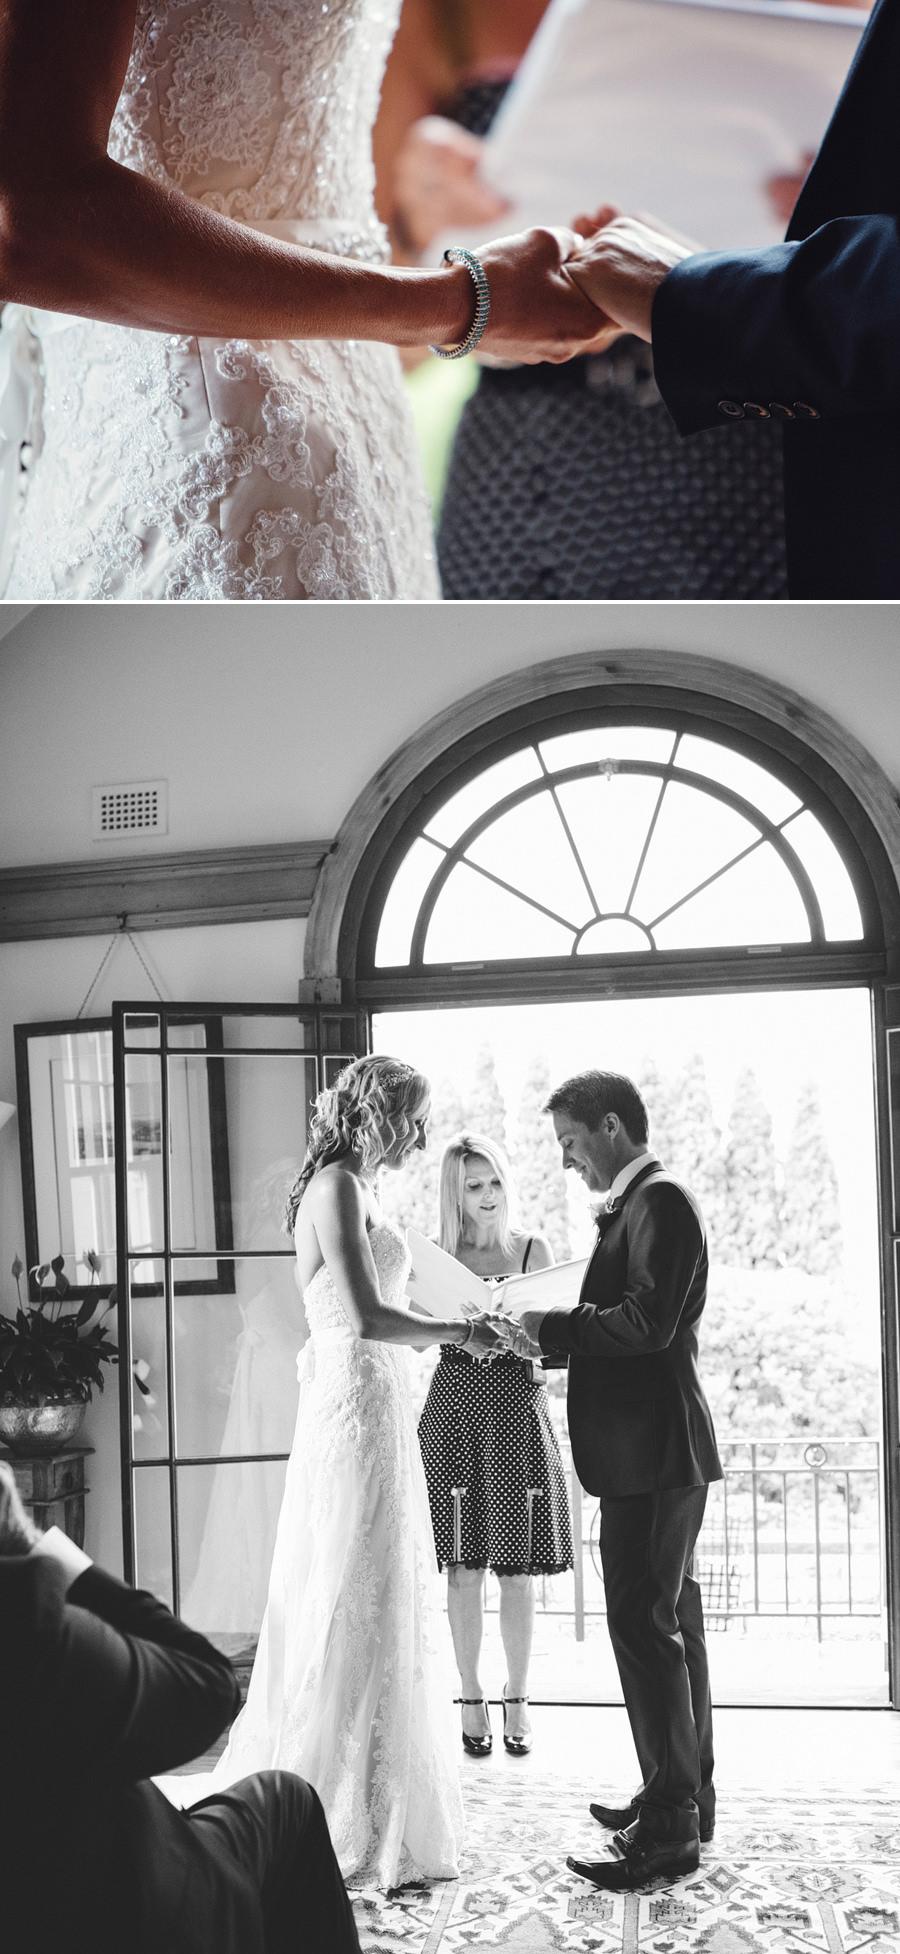 Intimate Wedding Photography: Ceremony